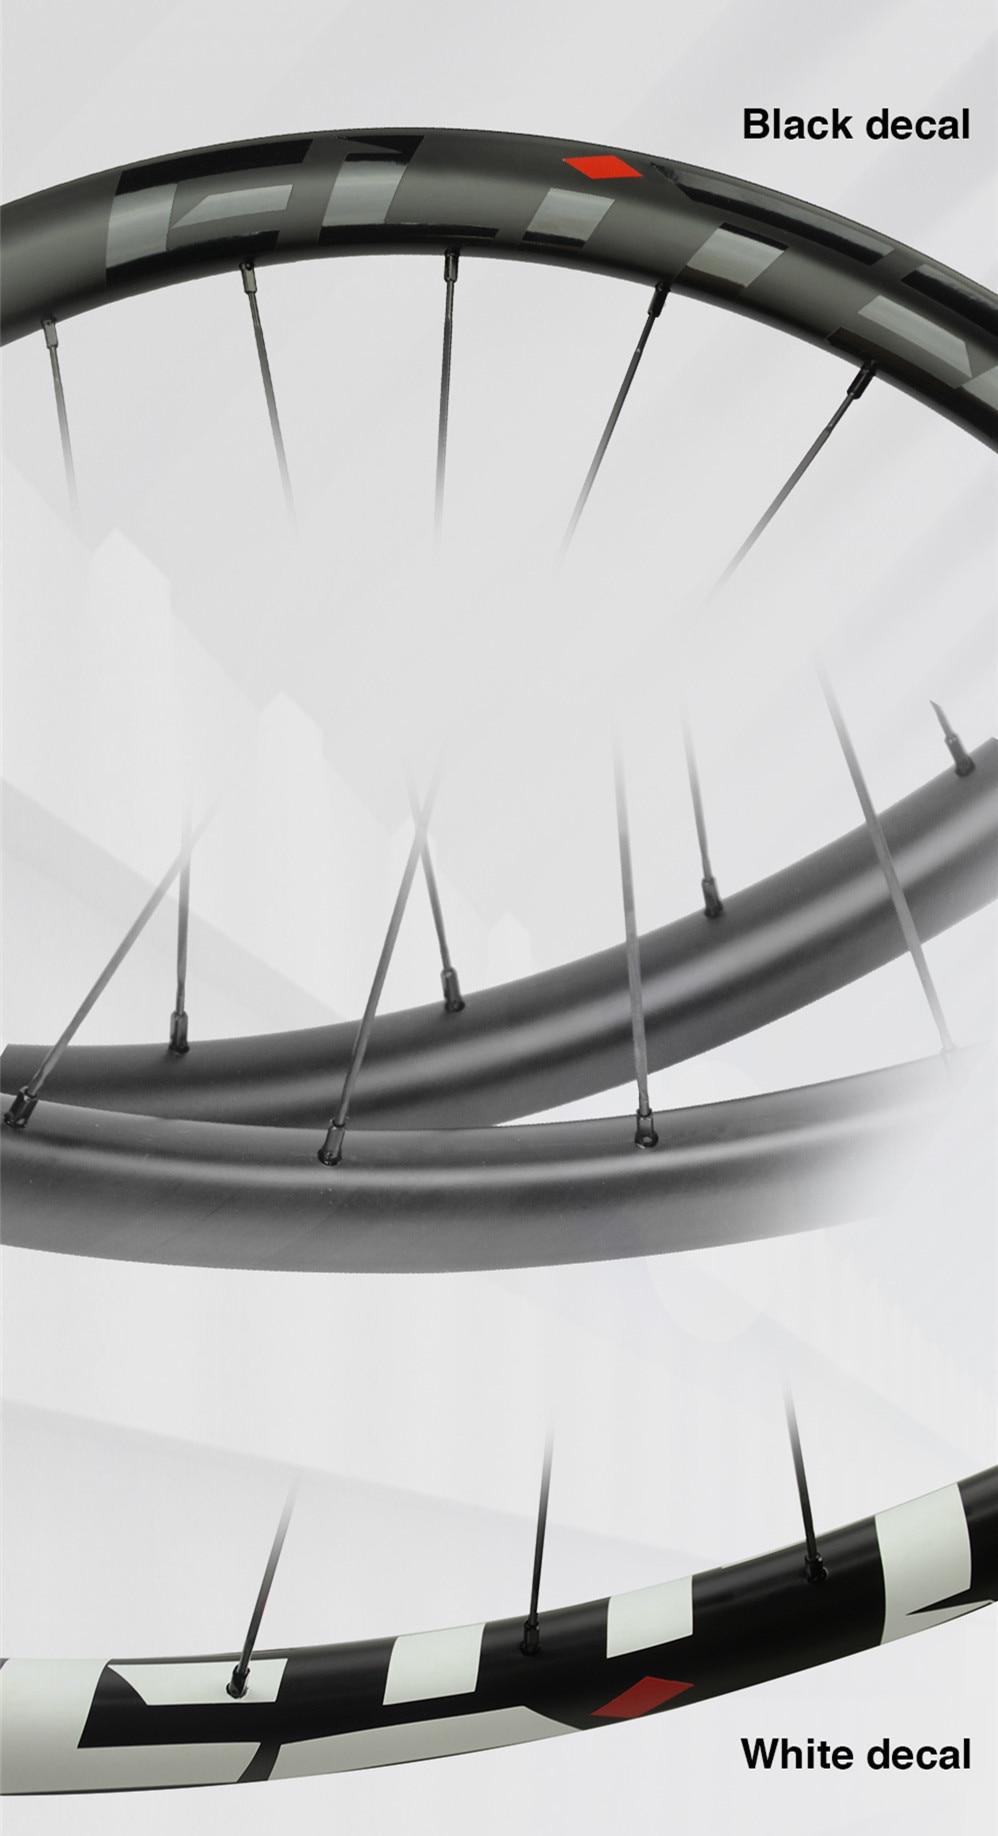 HTB1 N39bb9YBuNjy0Fgq6AxcXXaa - ELITE DT Swiss 350  All Mountain Wheelset 30mm*30mm Rim Tubeless 27.5 MTB Wheel Japan Toray T700 Carbon Fiber 1515g Only